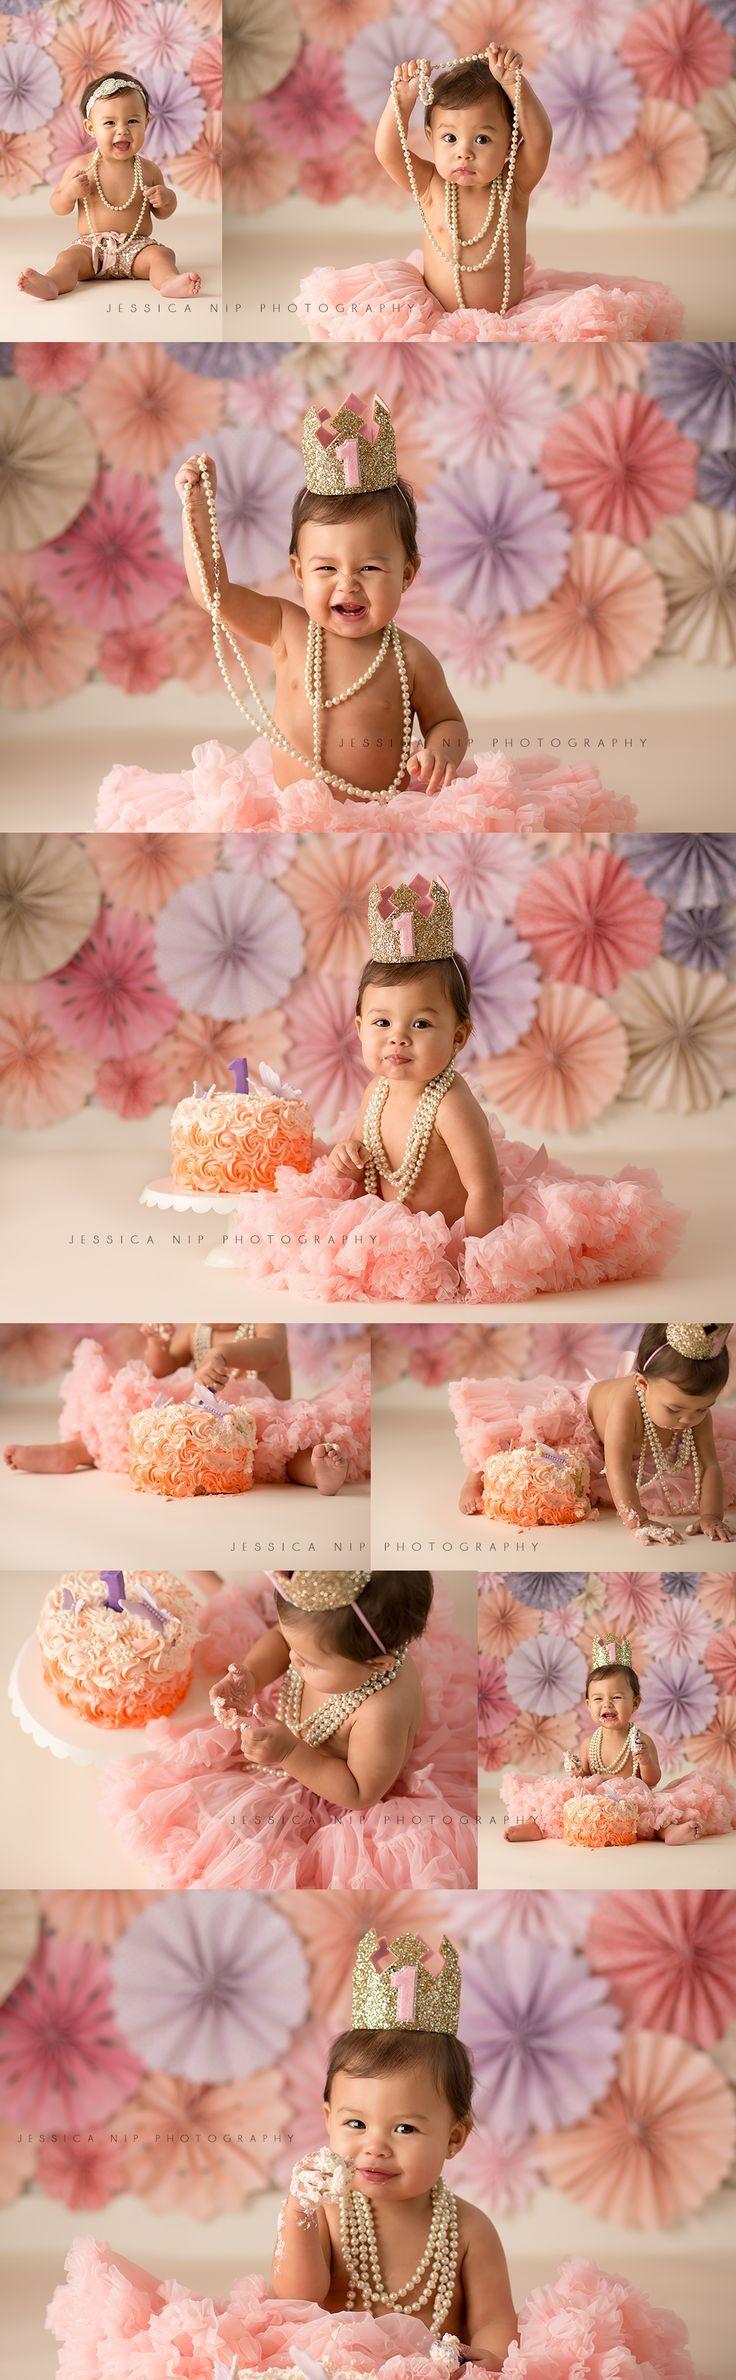 Girly Cake Smash Featuring Pinwheels, Pearls and a fabulous little princess! ©2015 www.jessicanip.com | Toronto, Canada | Jessica Nip Photography | info@jessicanip.com